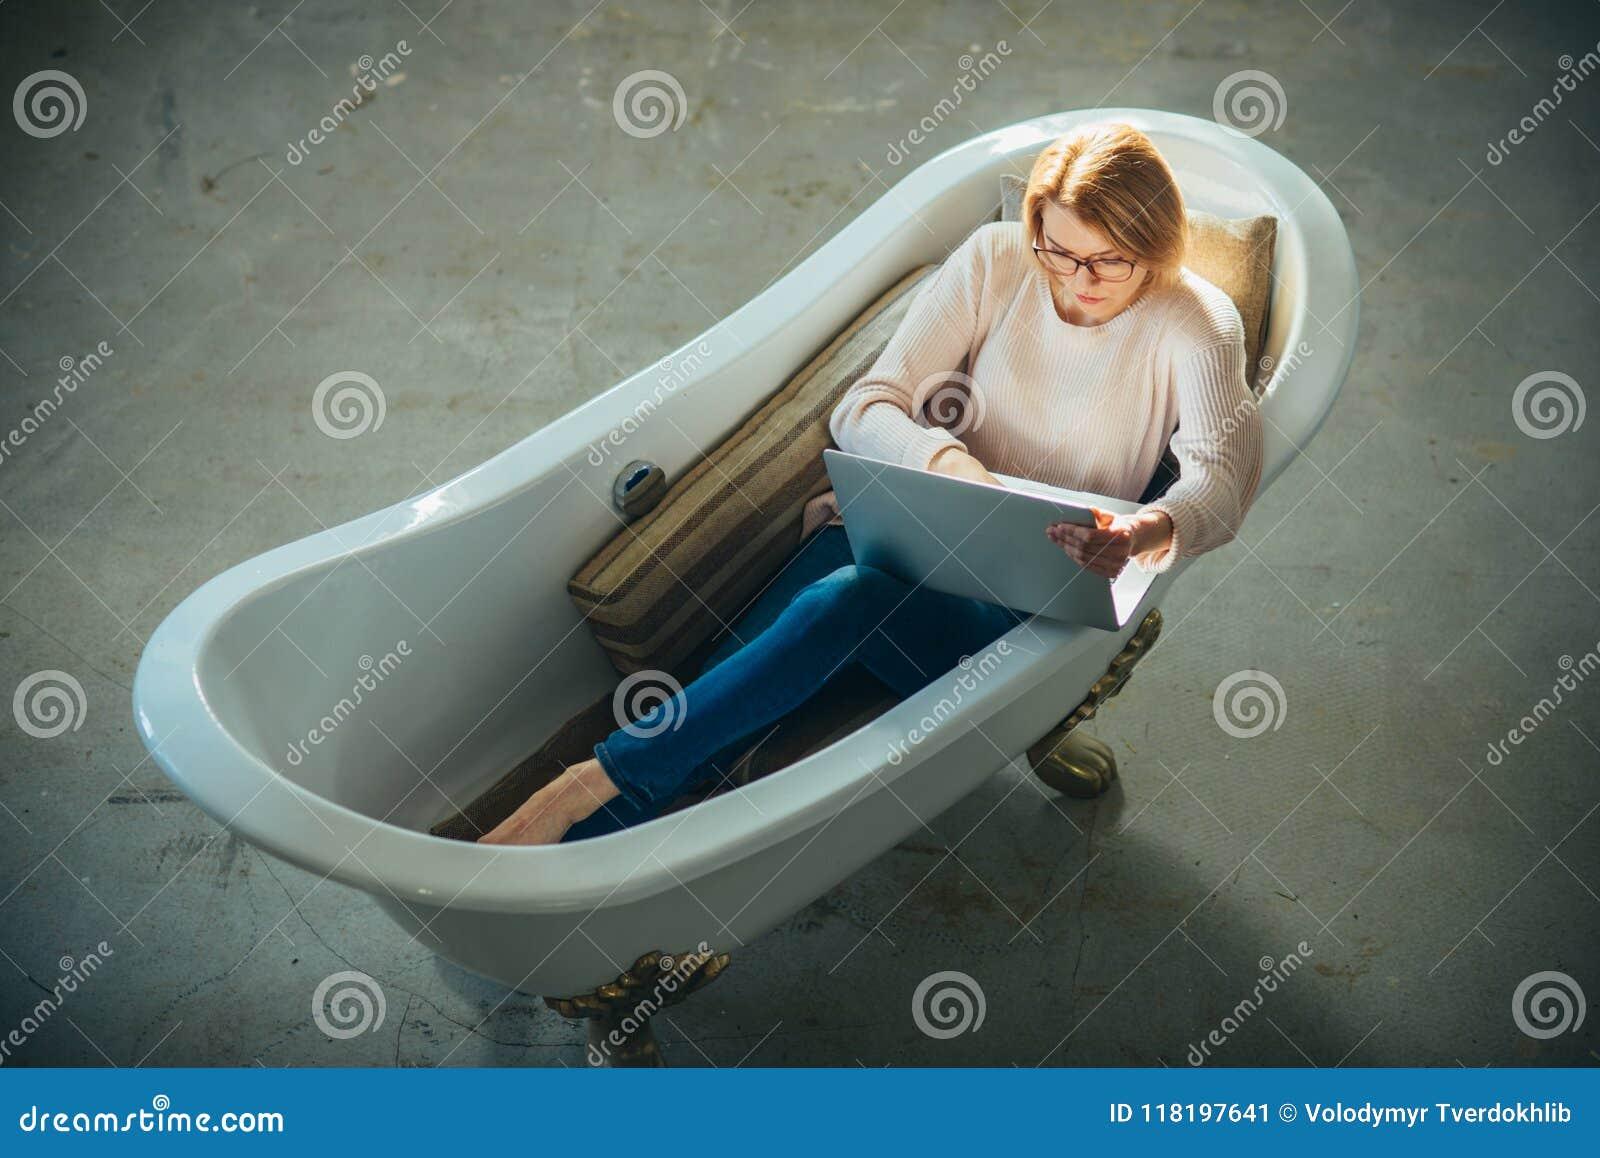 Het meisje ontspant in badkuip met laptop houdt blog Behendige zaken en mededeling Koop online en digitale marketing